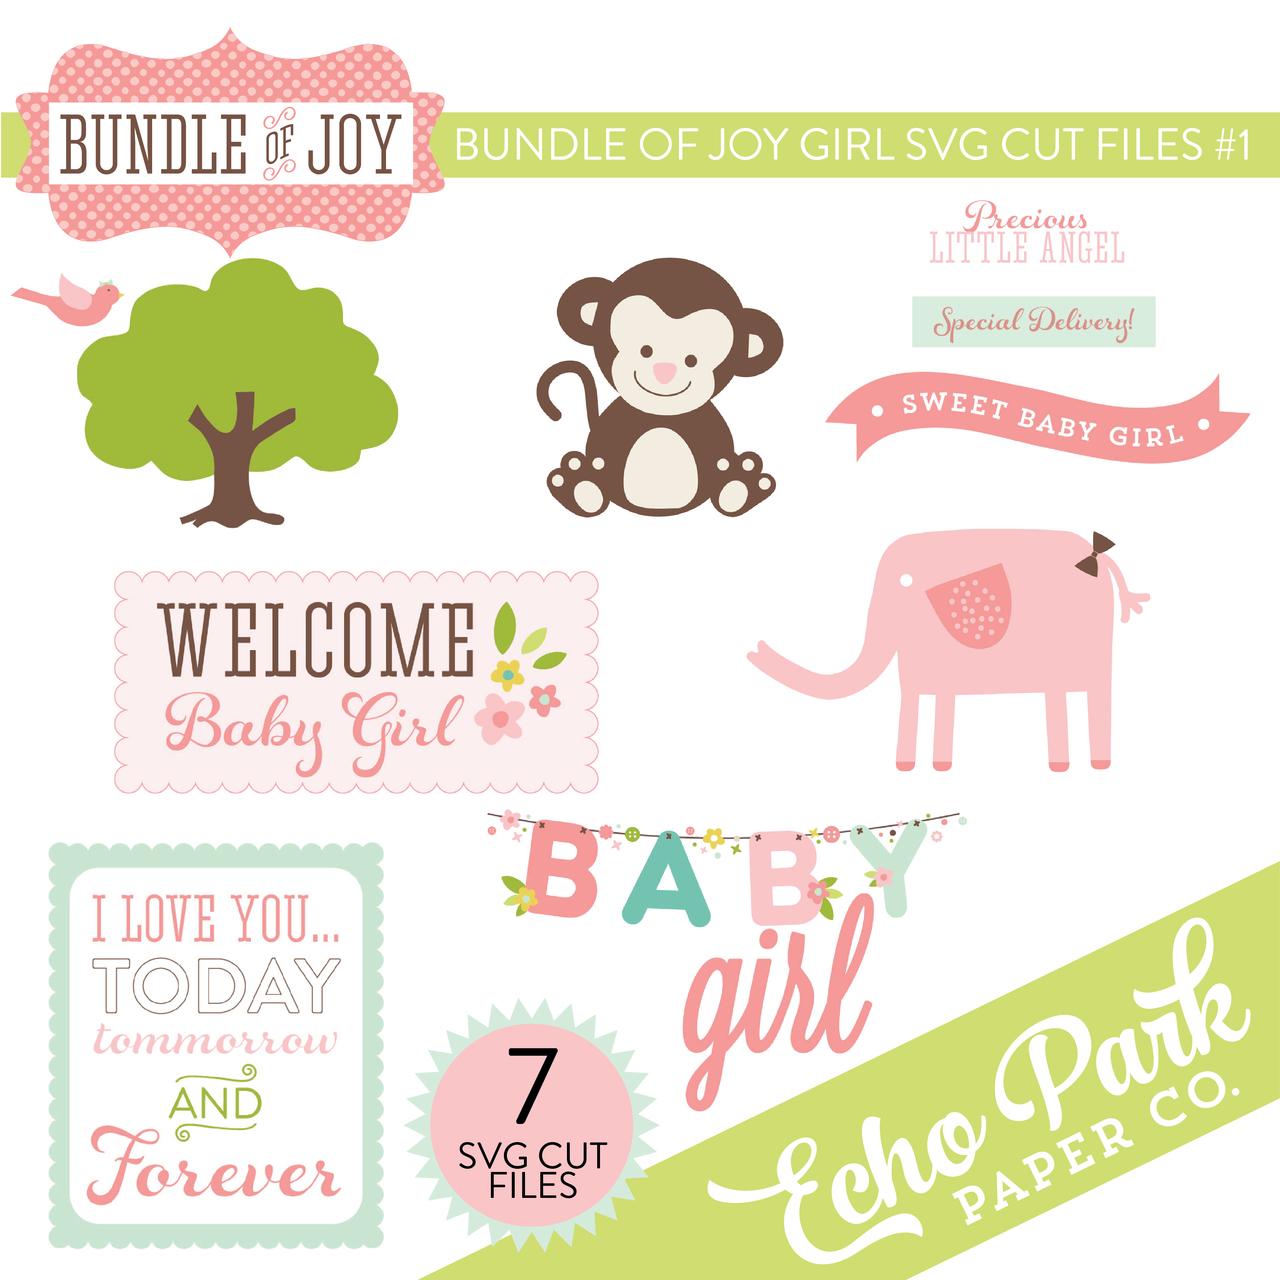 Bundle of Joy - Girl SVG Cut Files #1